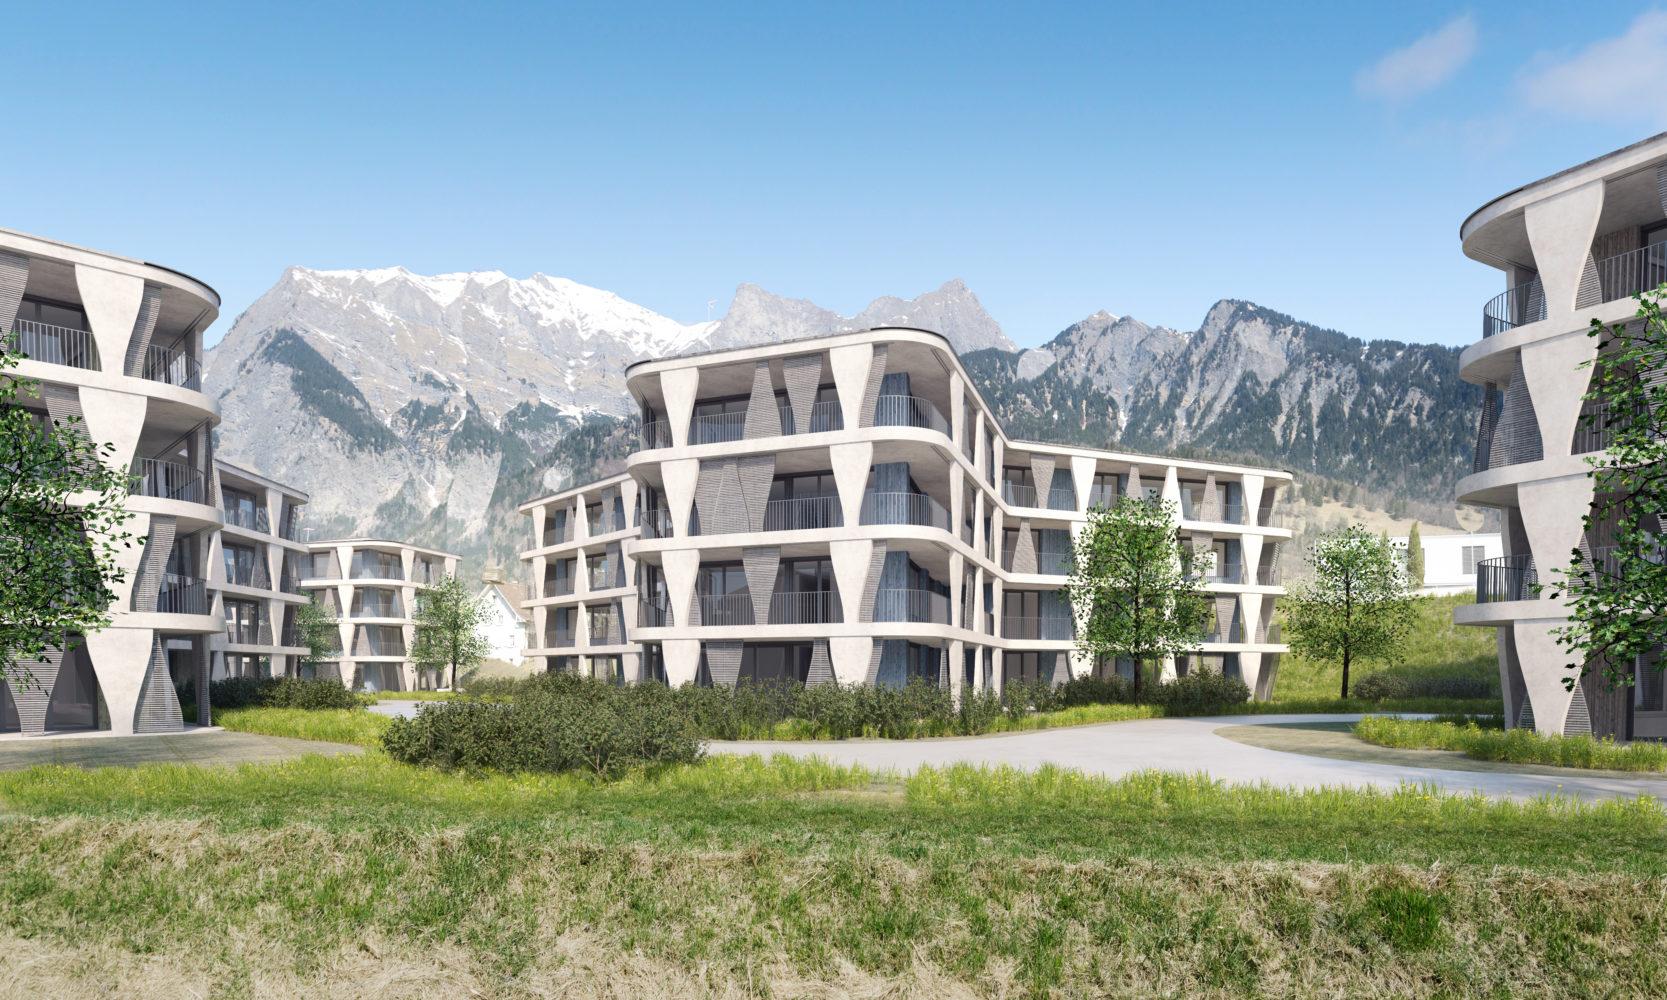 Eigentumswohnungen in Maienfeld